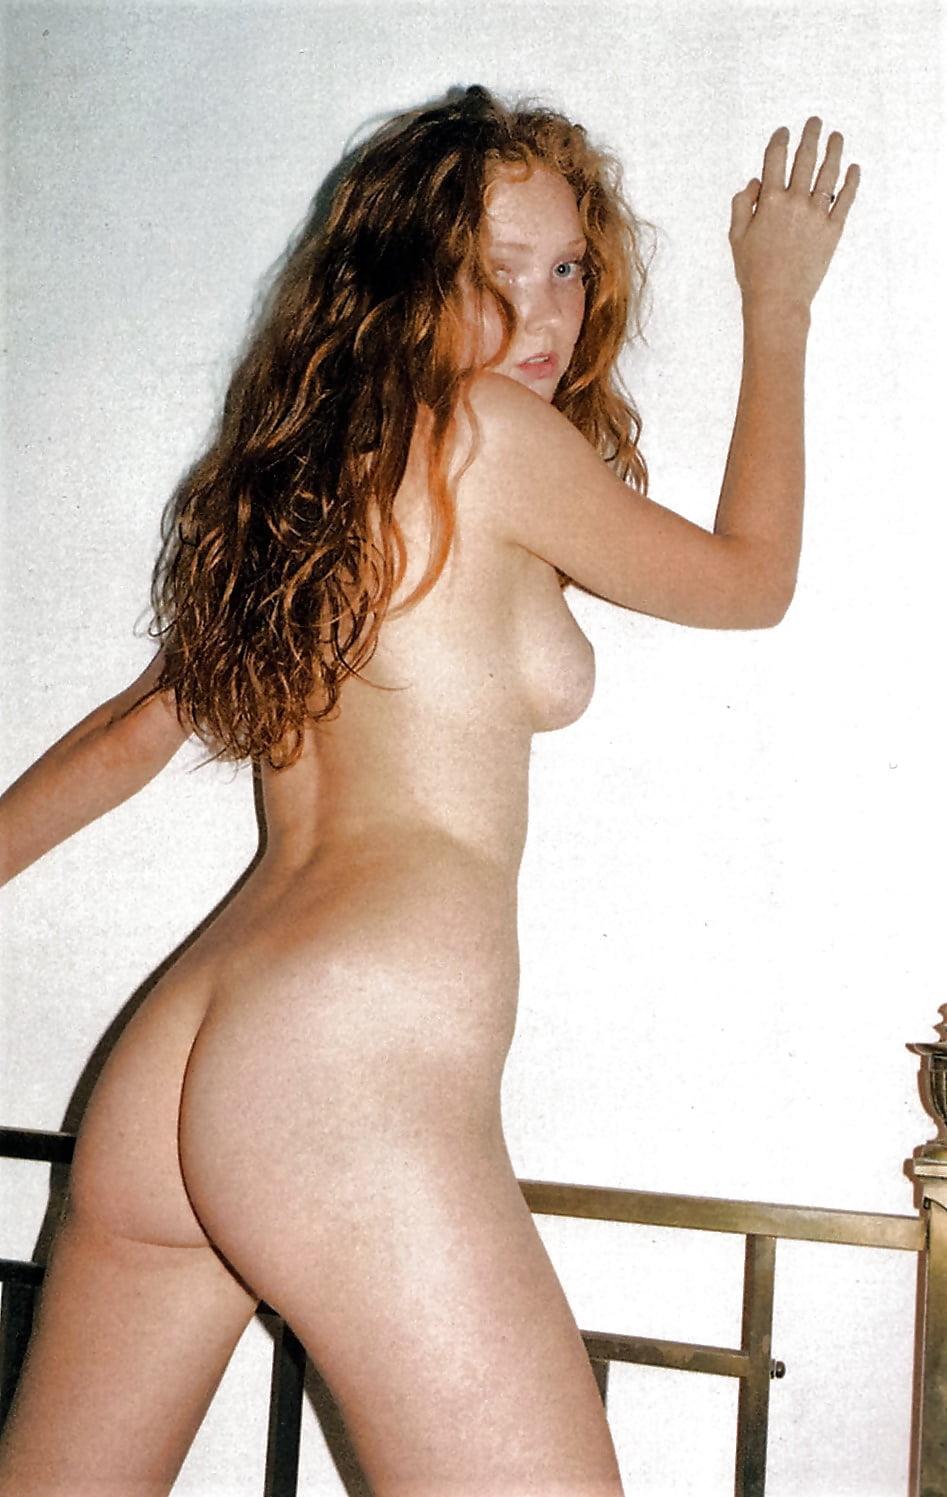 Swimwear Ginger Poole Actress Naked Photos Jpg